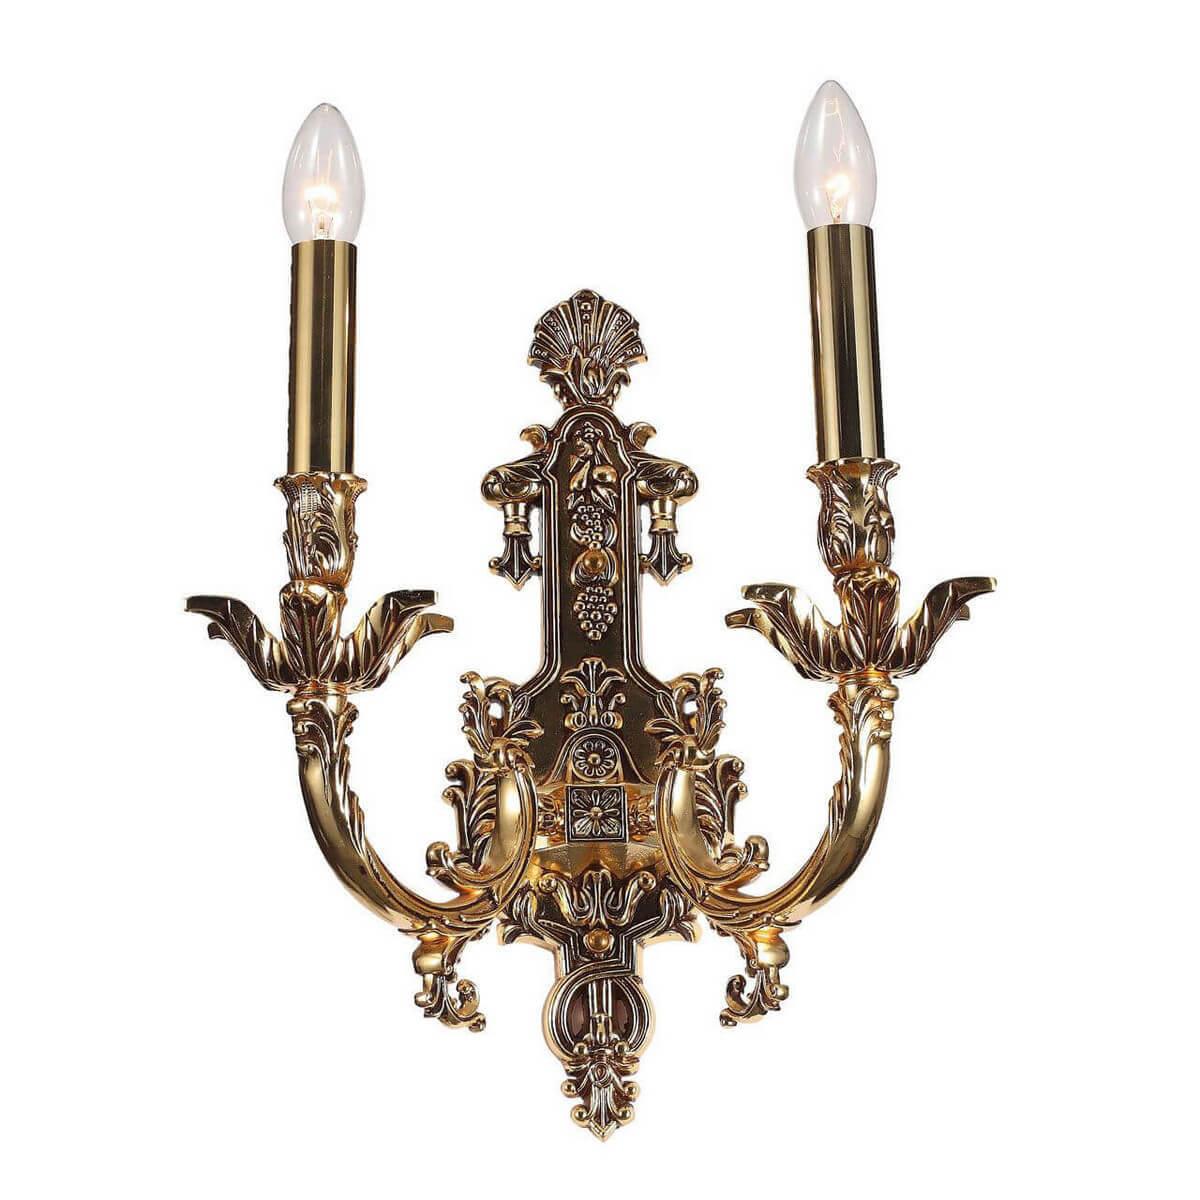 Бра Lucia Tucci Firenze W1781.2 Antique Gold